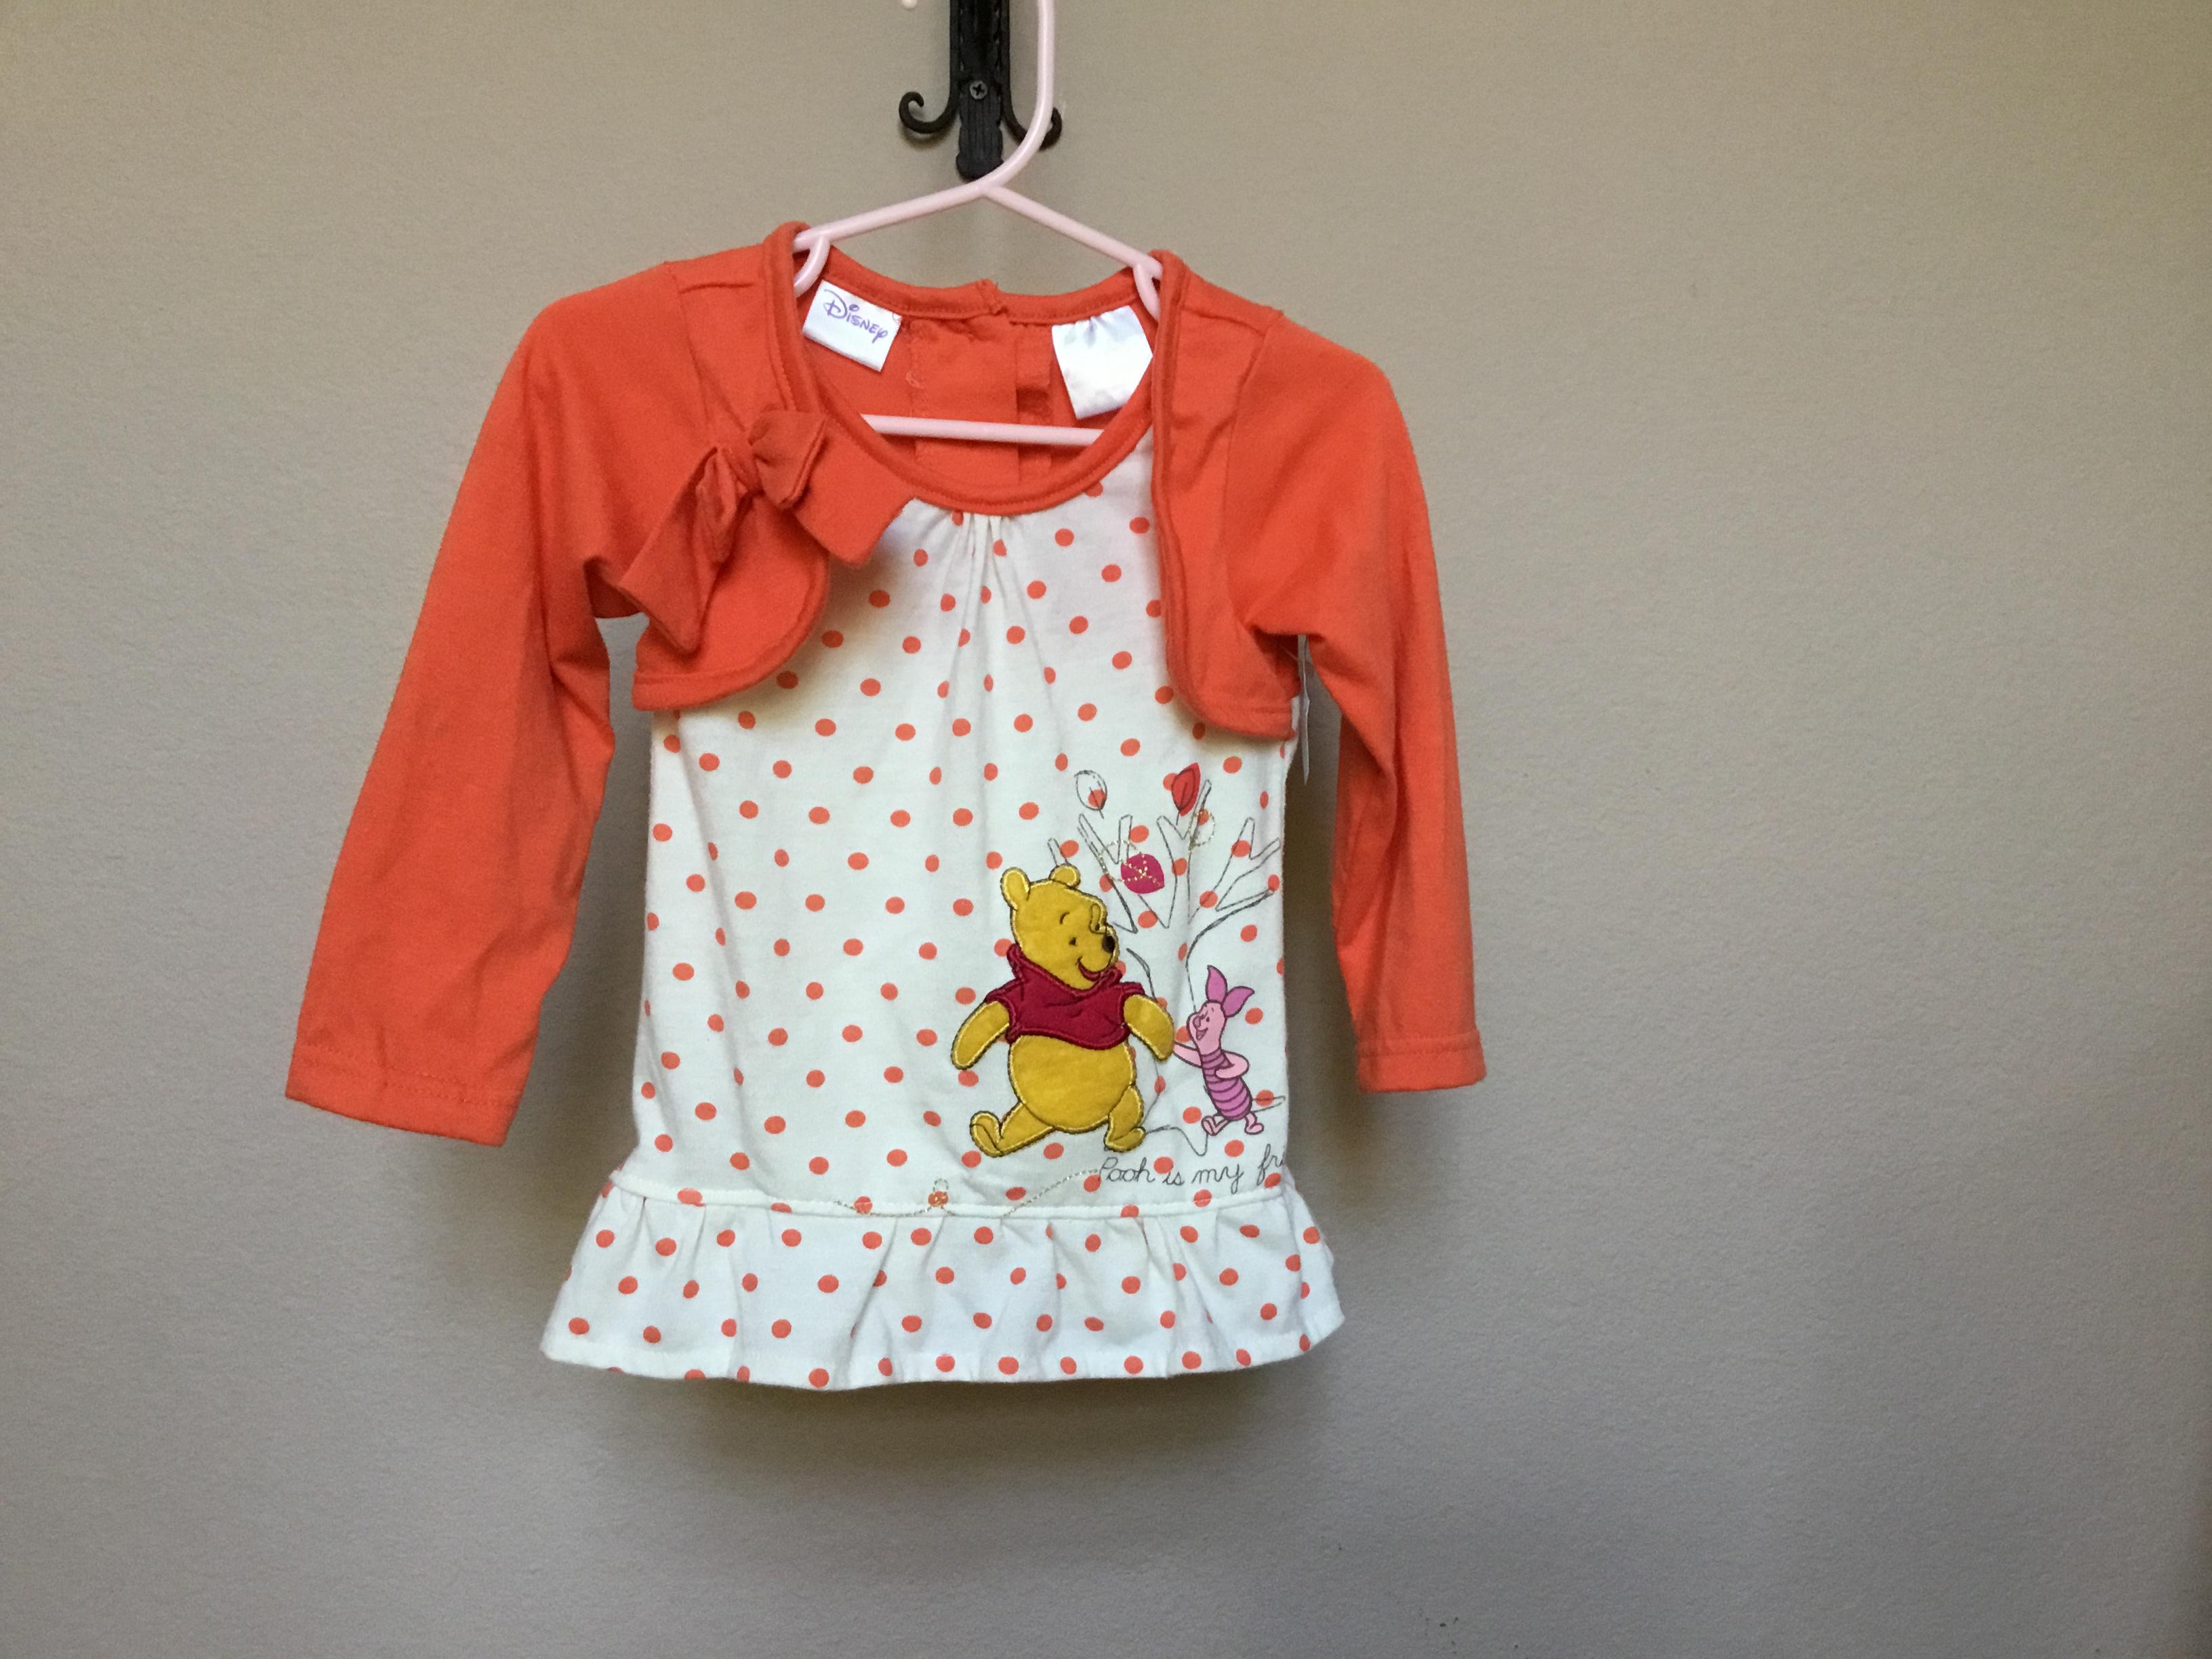 095fd7ae7a76 2T Disney Winnie The Pooh with Piglet Pooh is my friend Beige with Orange  Polka DotsDress